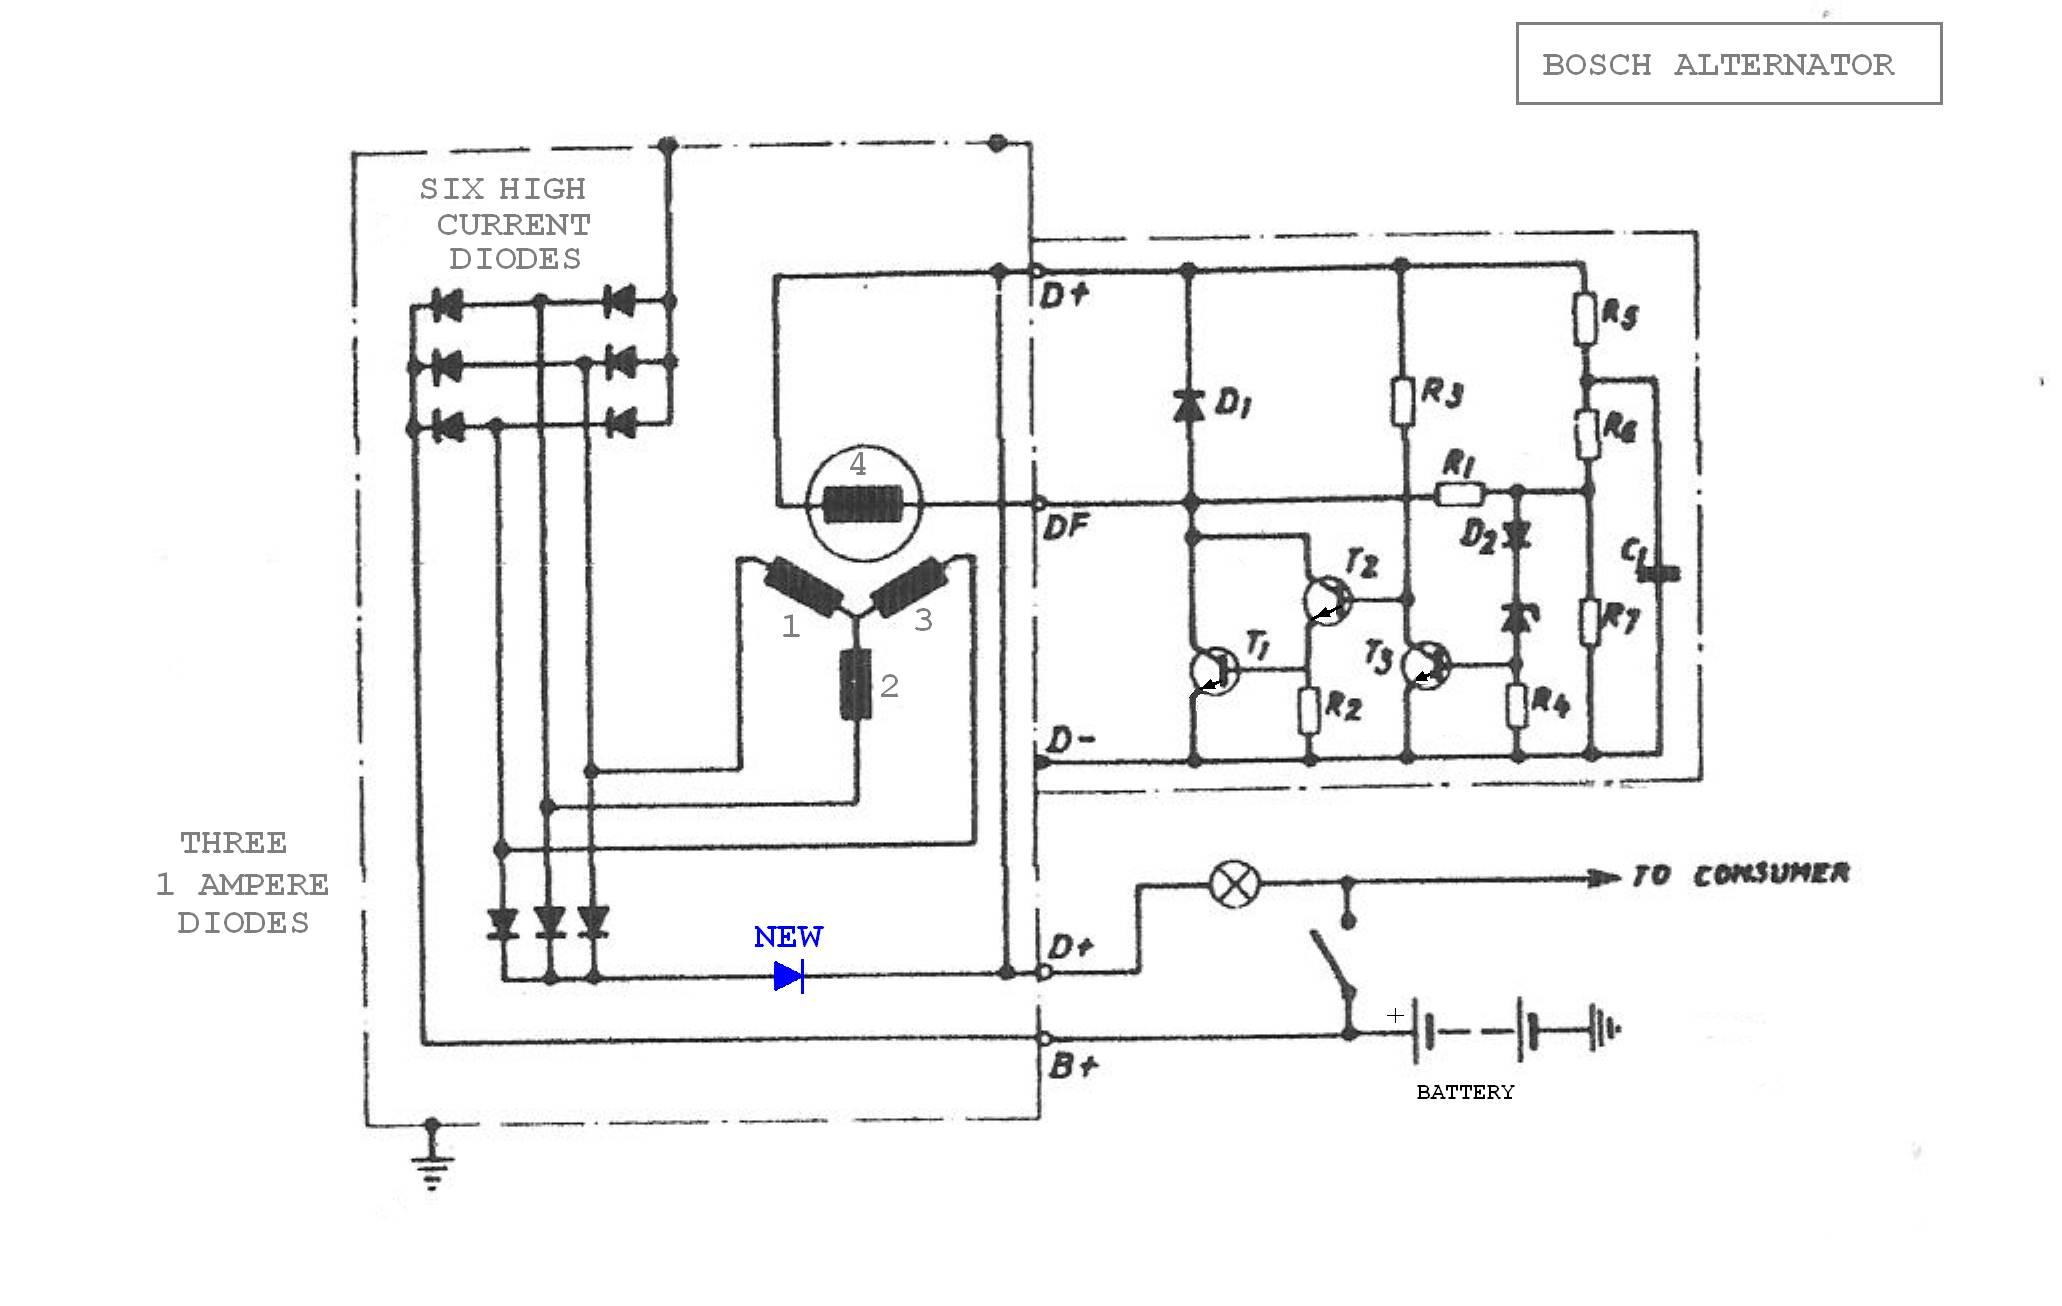 higher voltage fool your alternator page 2 electronics forum alternator bosch 2 jpg